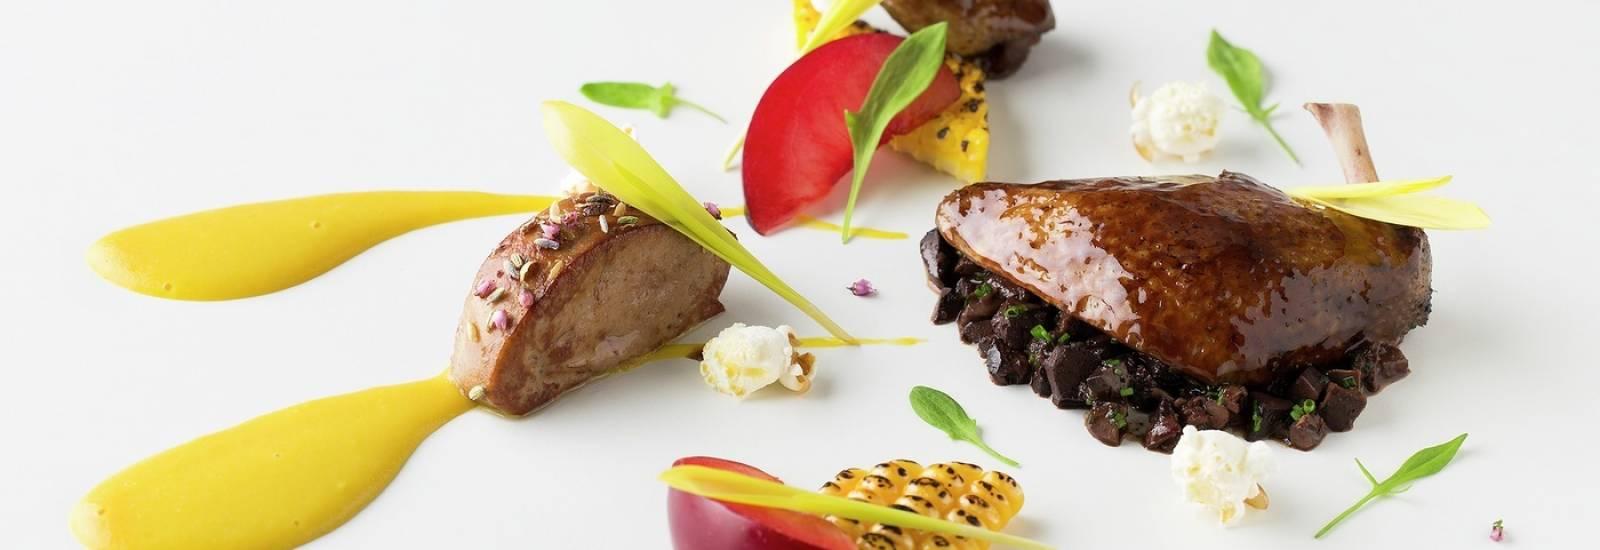 Gordon Ramsay Restaurants London Gift Vouchers